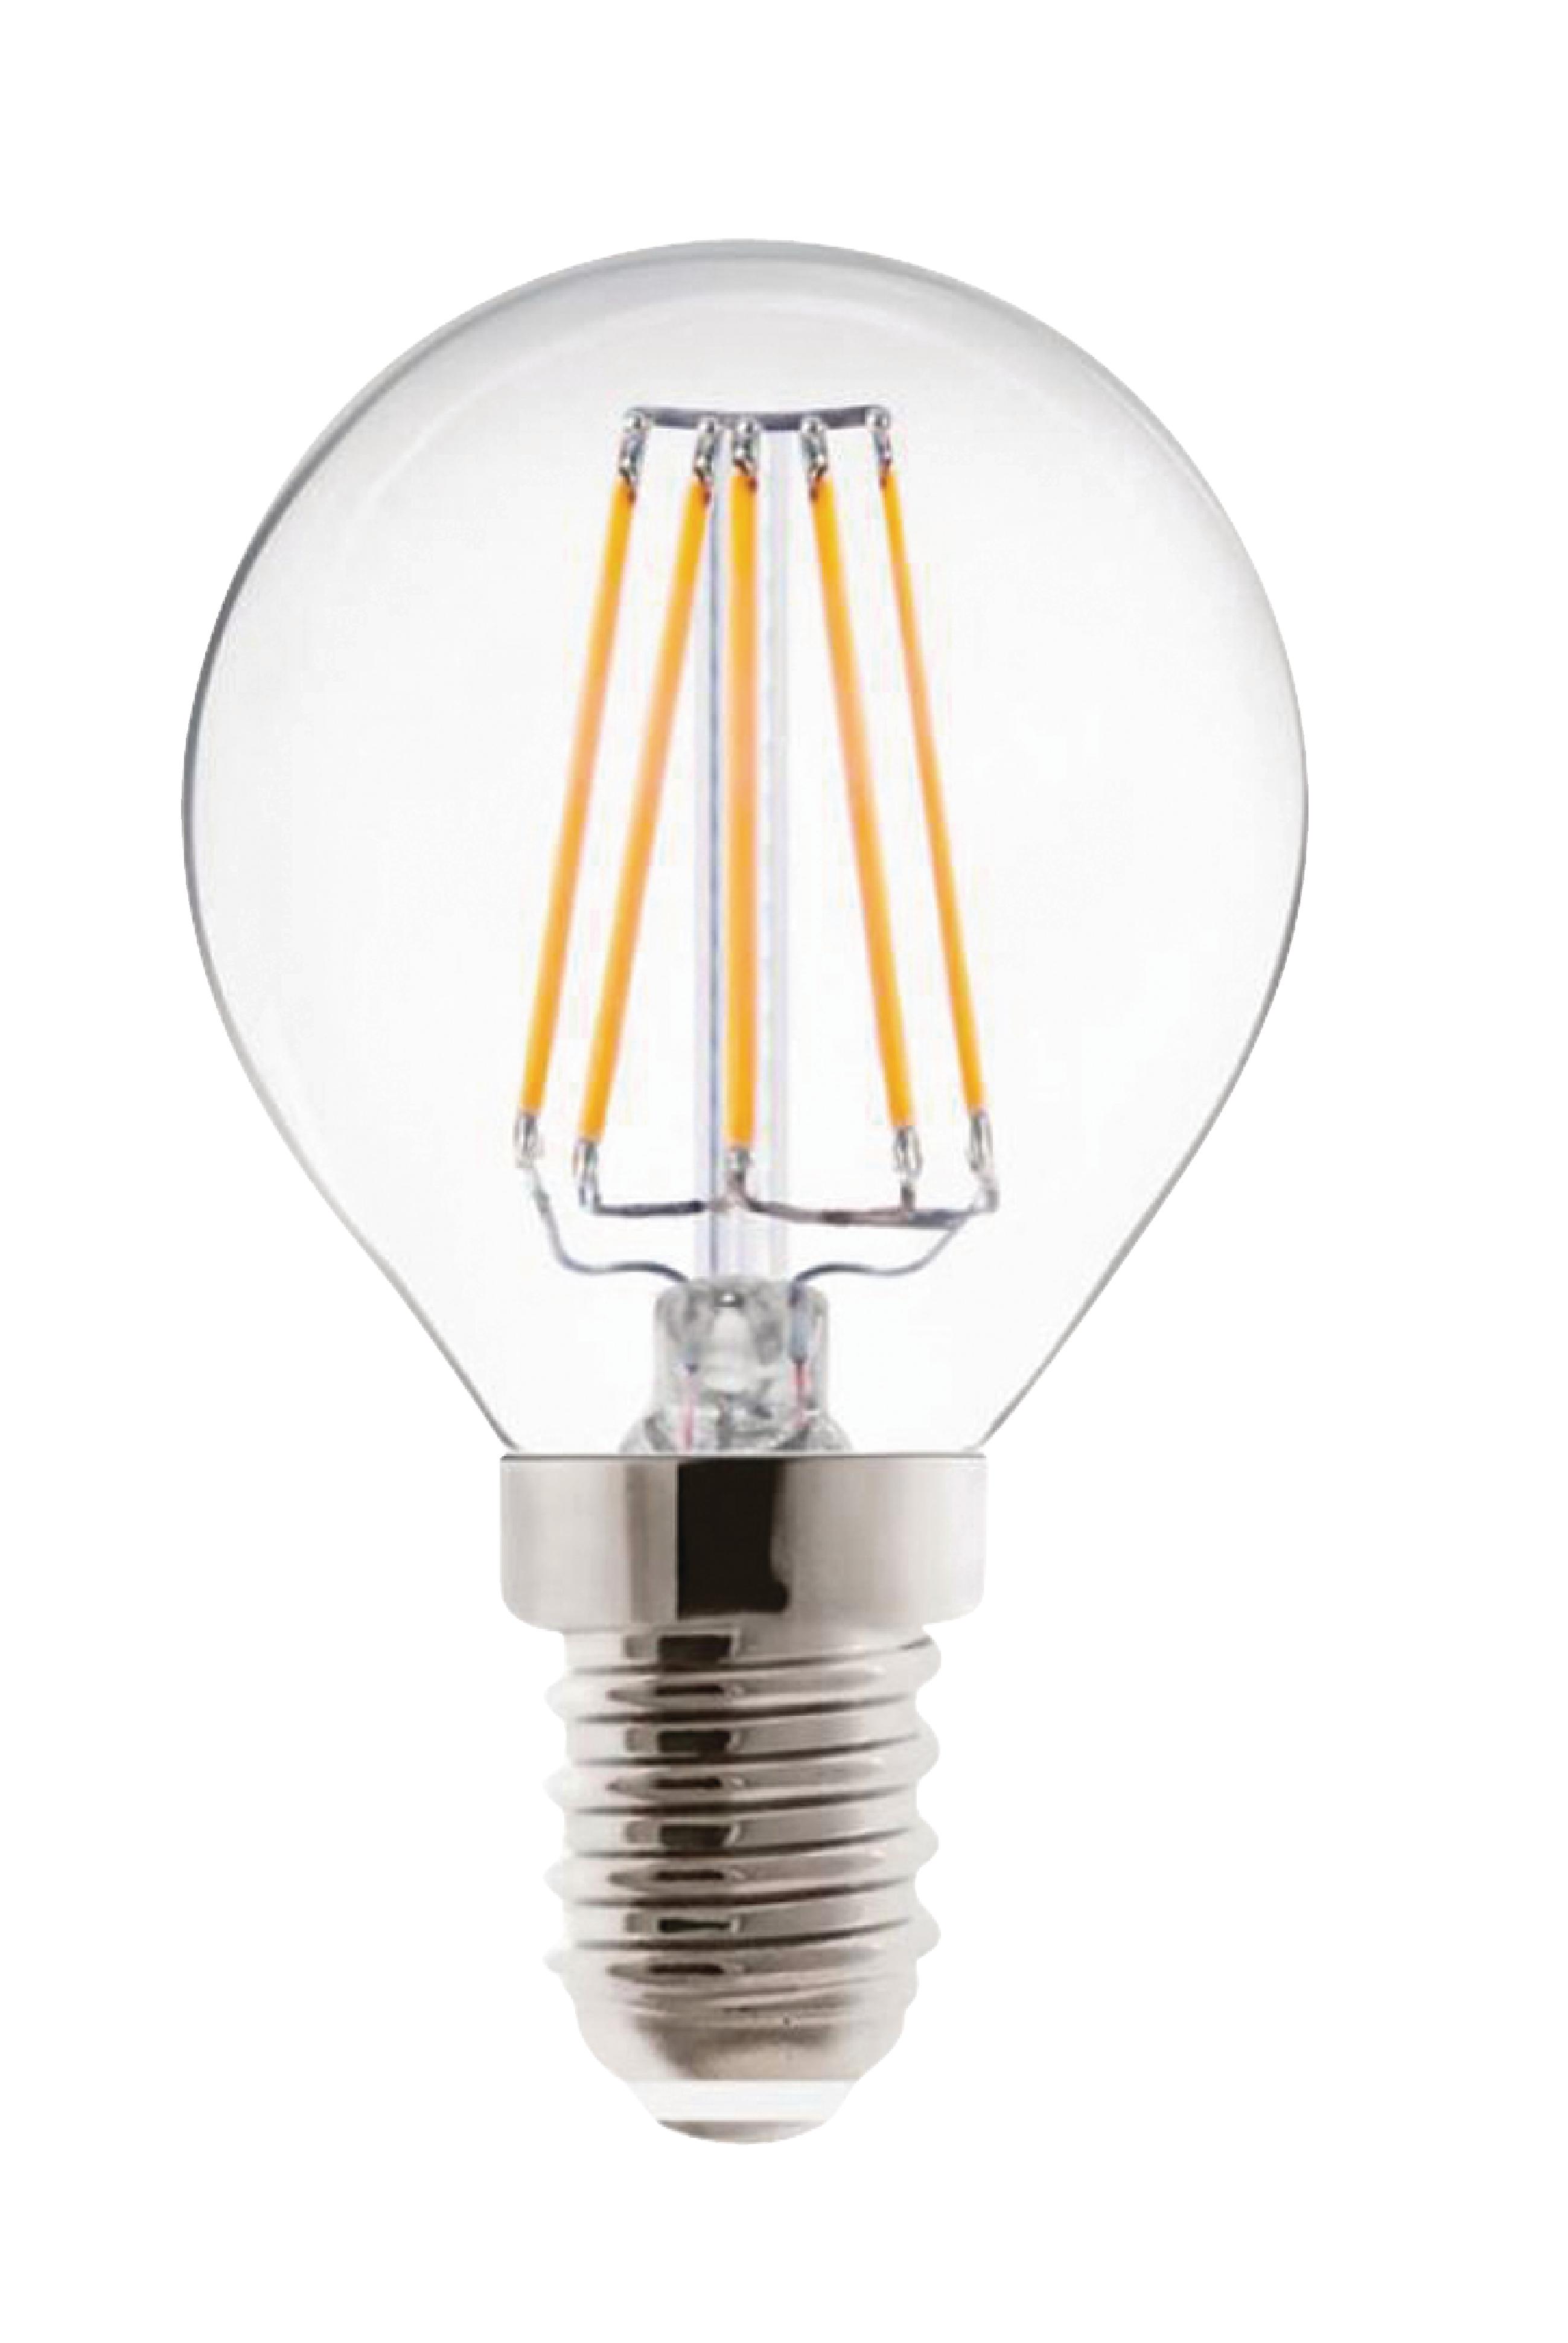 gluhlampe-led-vintage-mini-globe-2-w-245-lm-2700-k